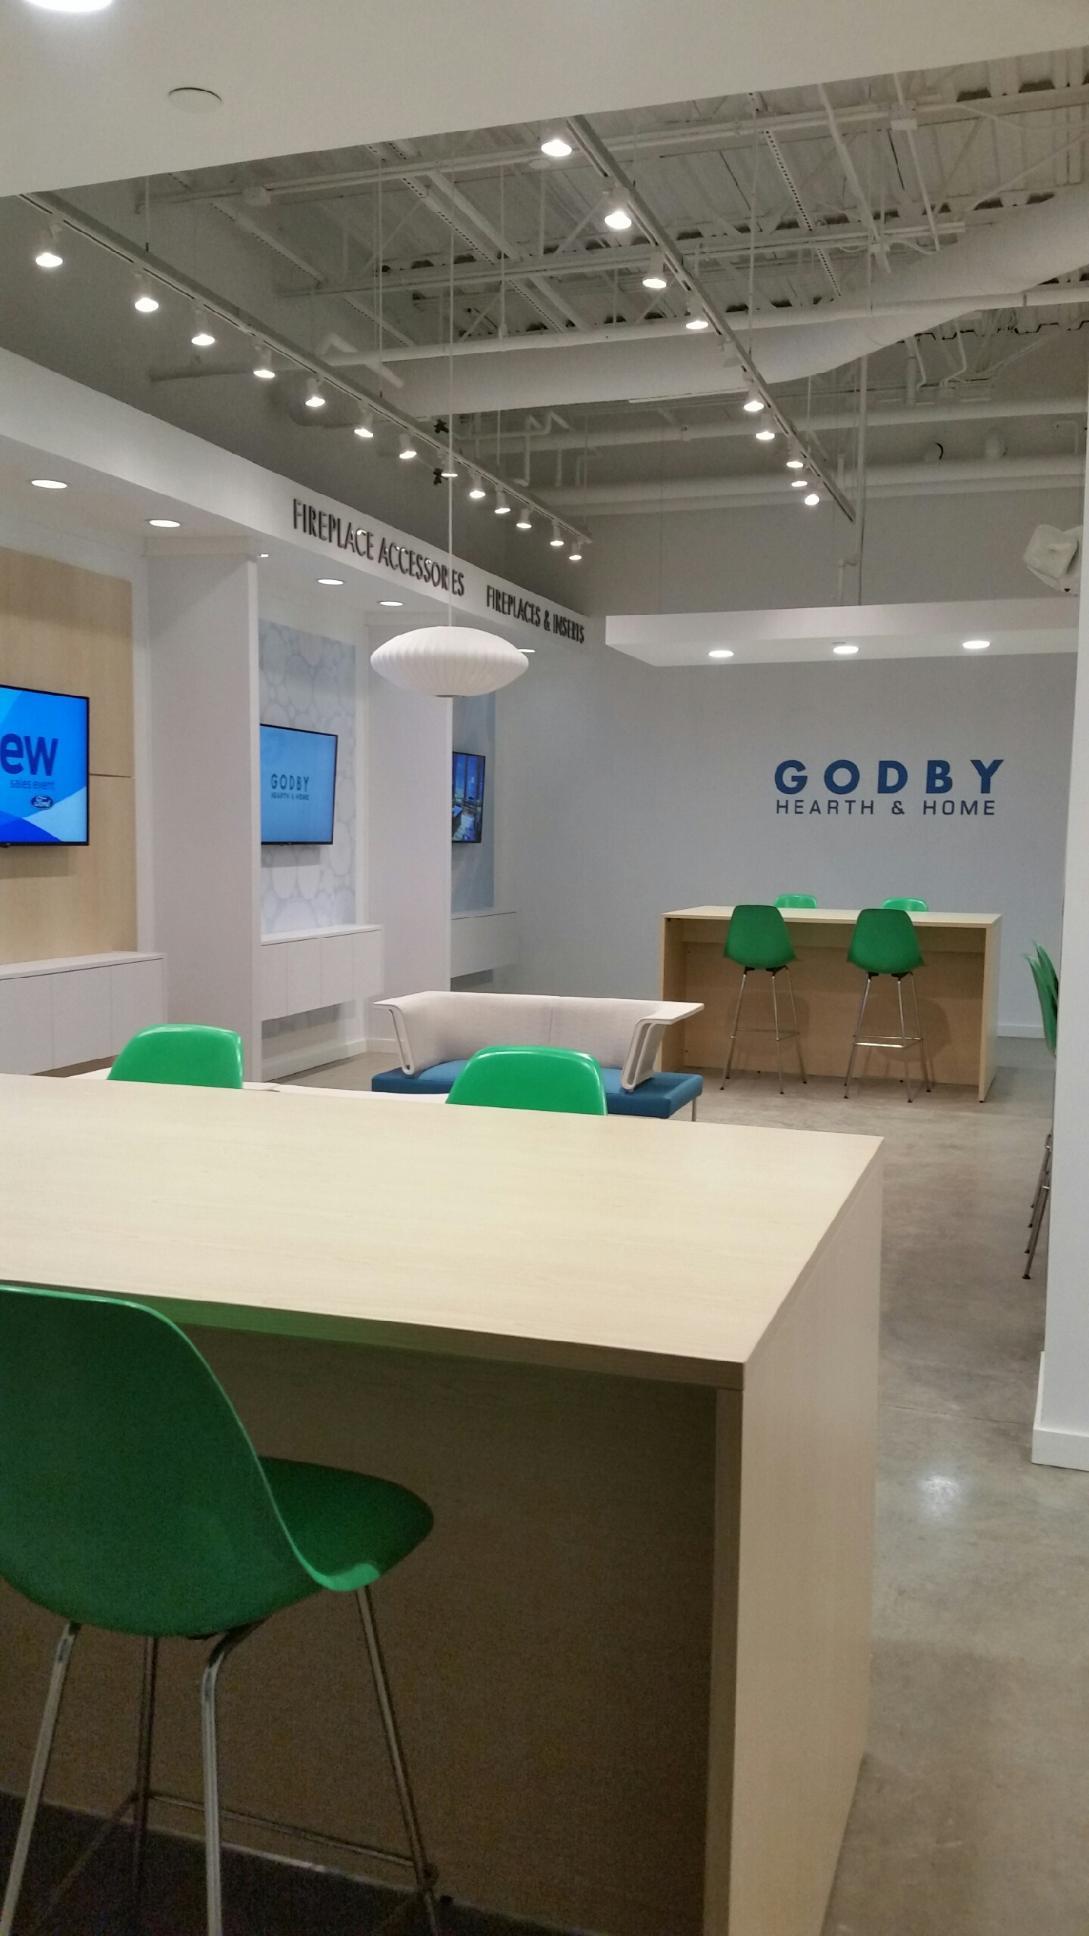 Godby Hearth & Home